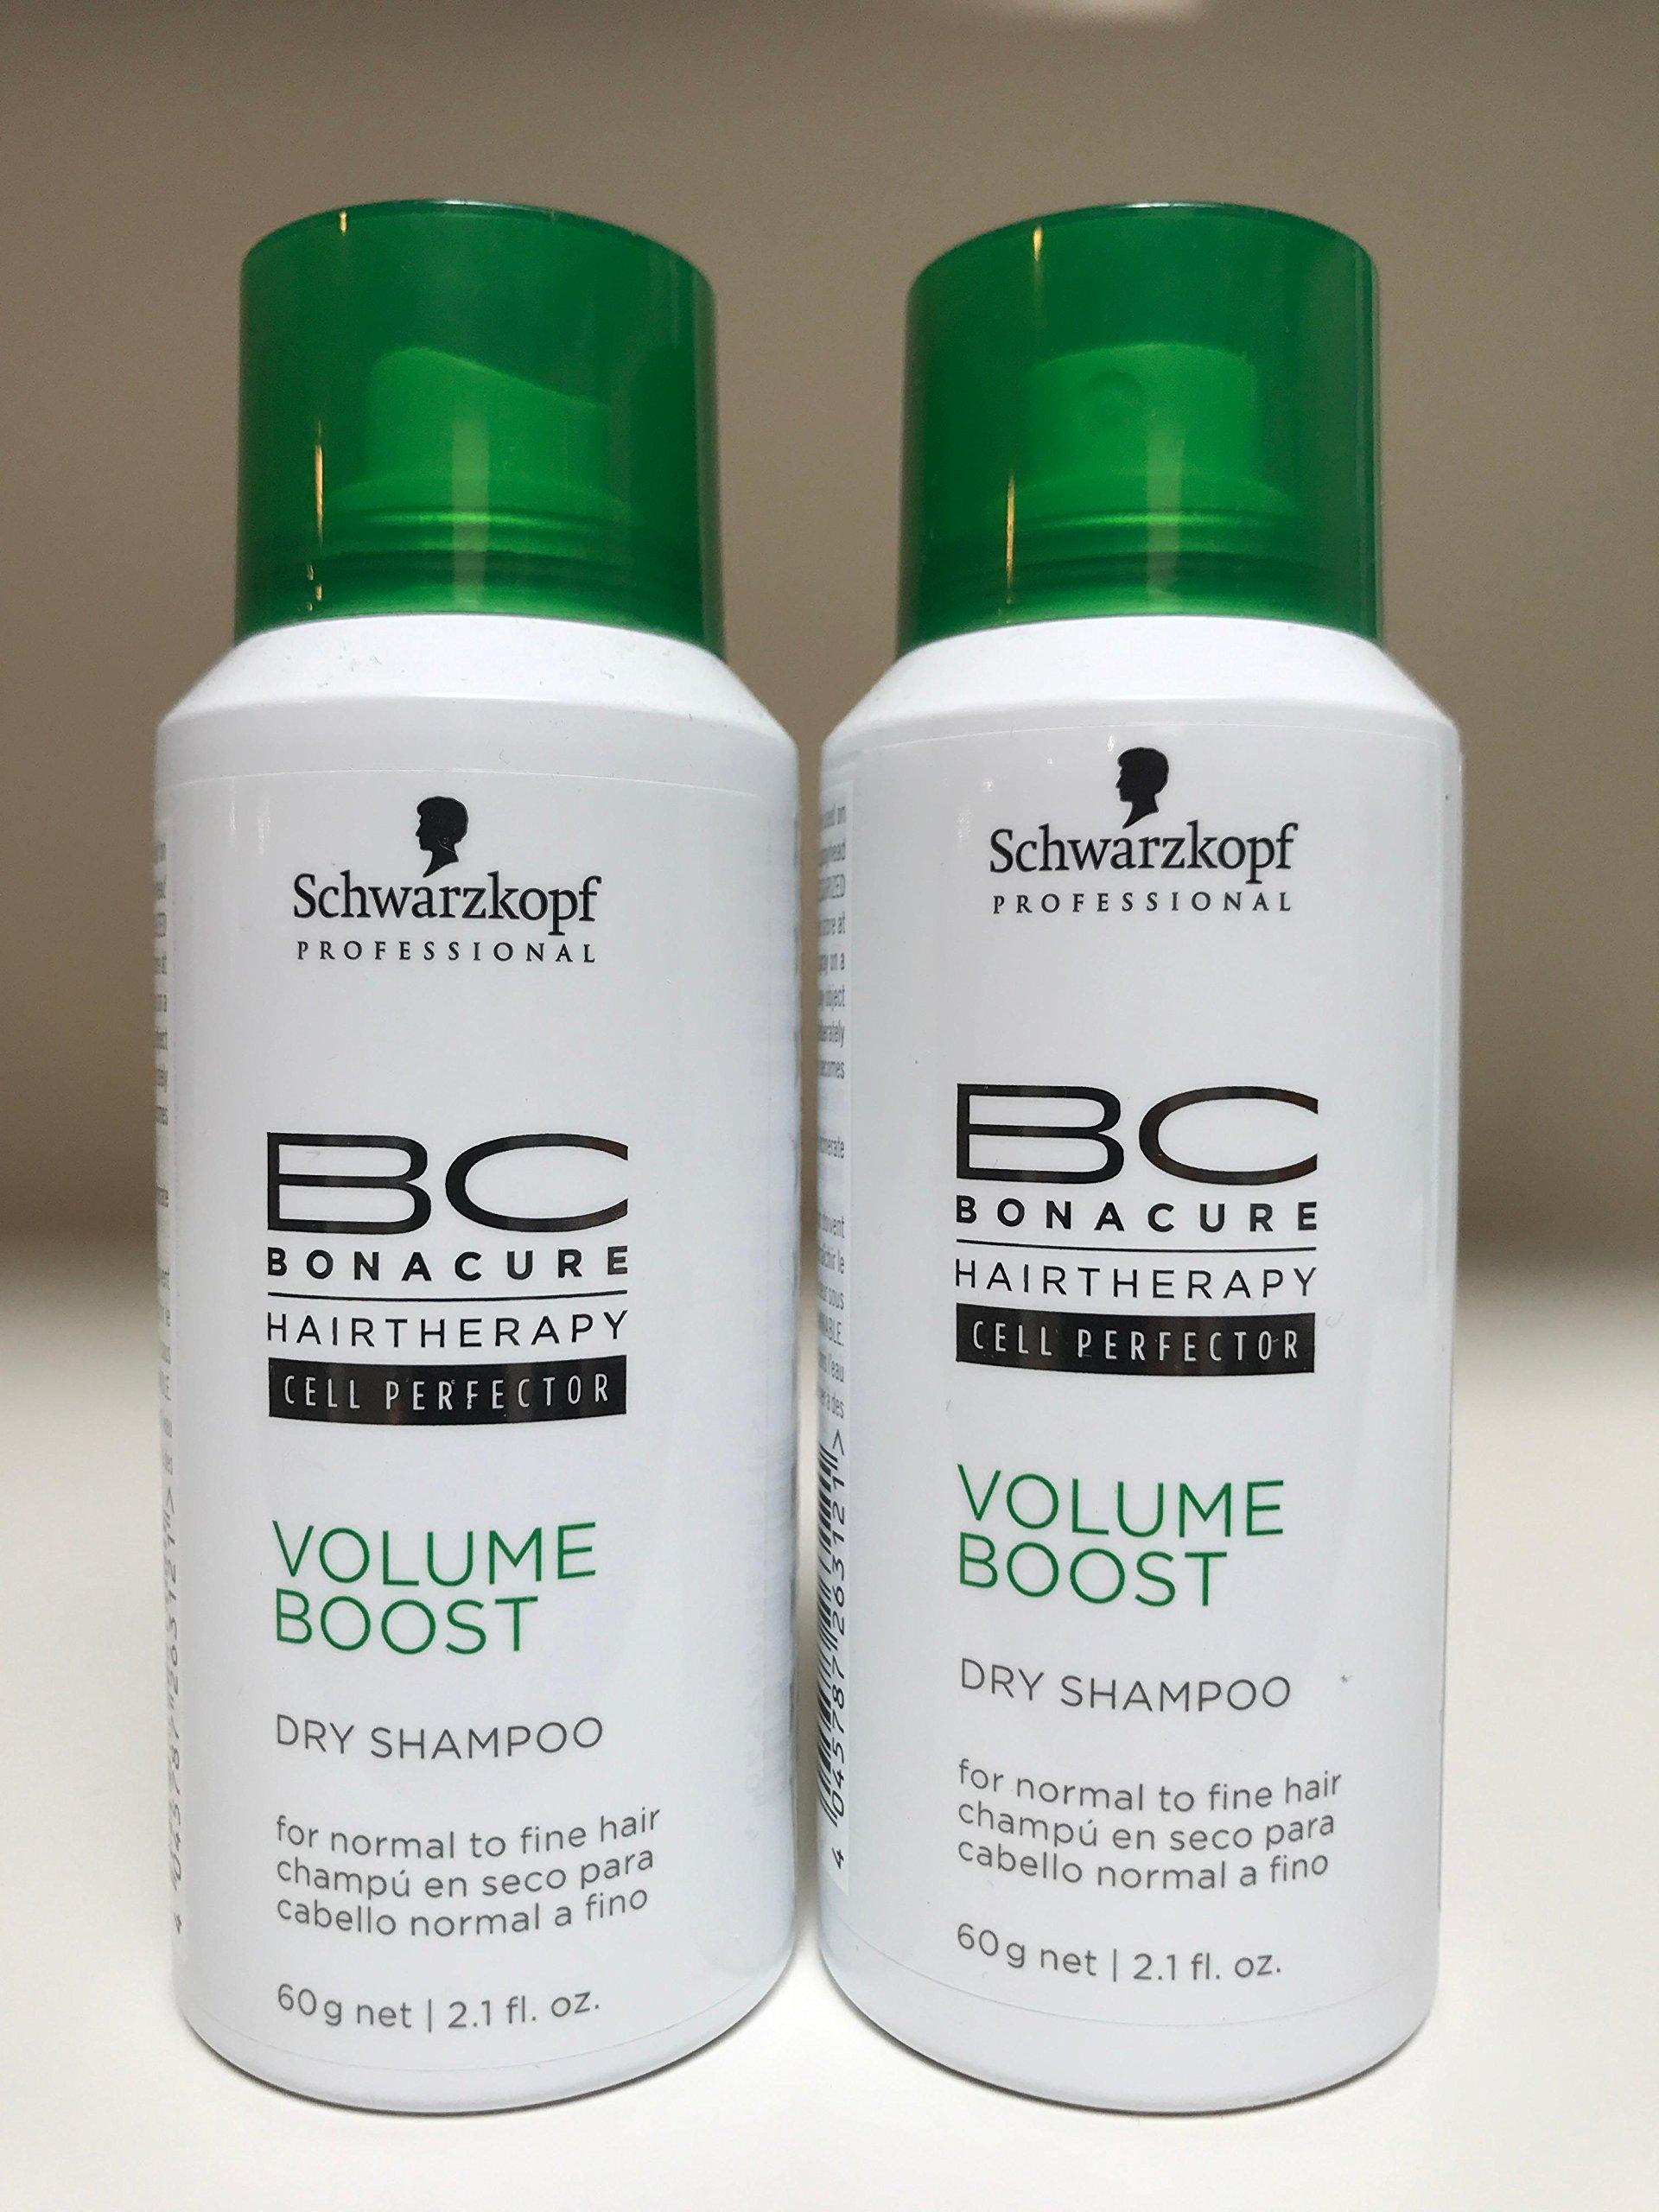 Schwarzkopf BC Bonacure Volume Boost Dry Shampoo - Set of 2 - 2.1 oz each by Schwarzkopf